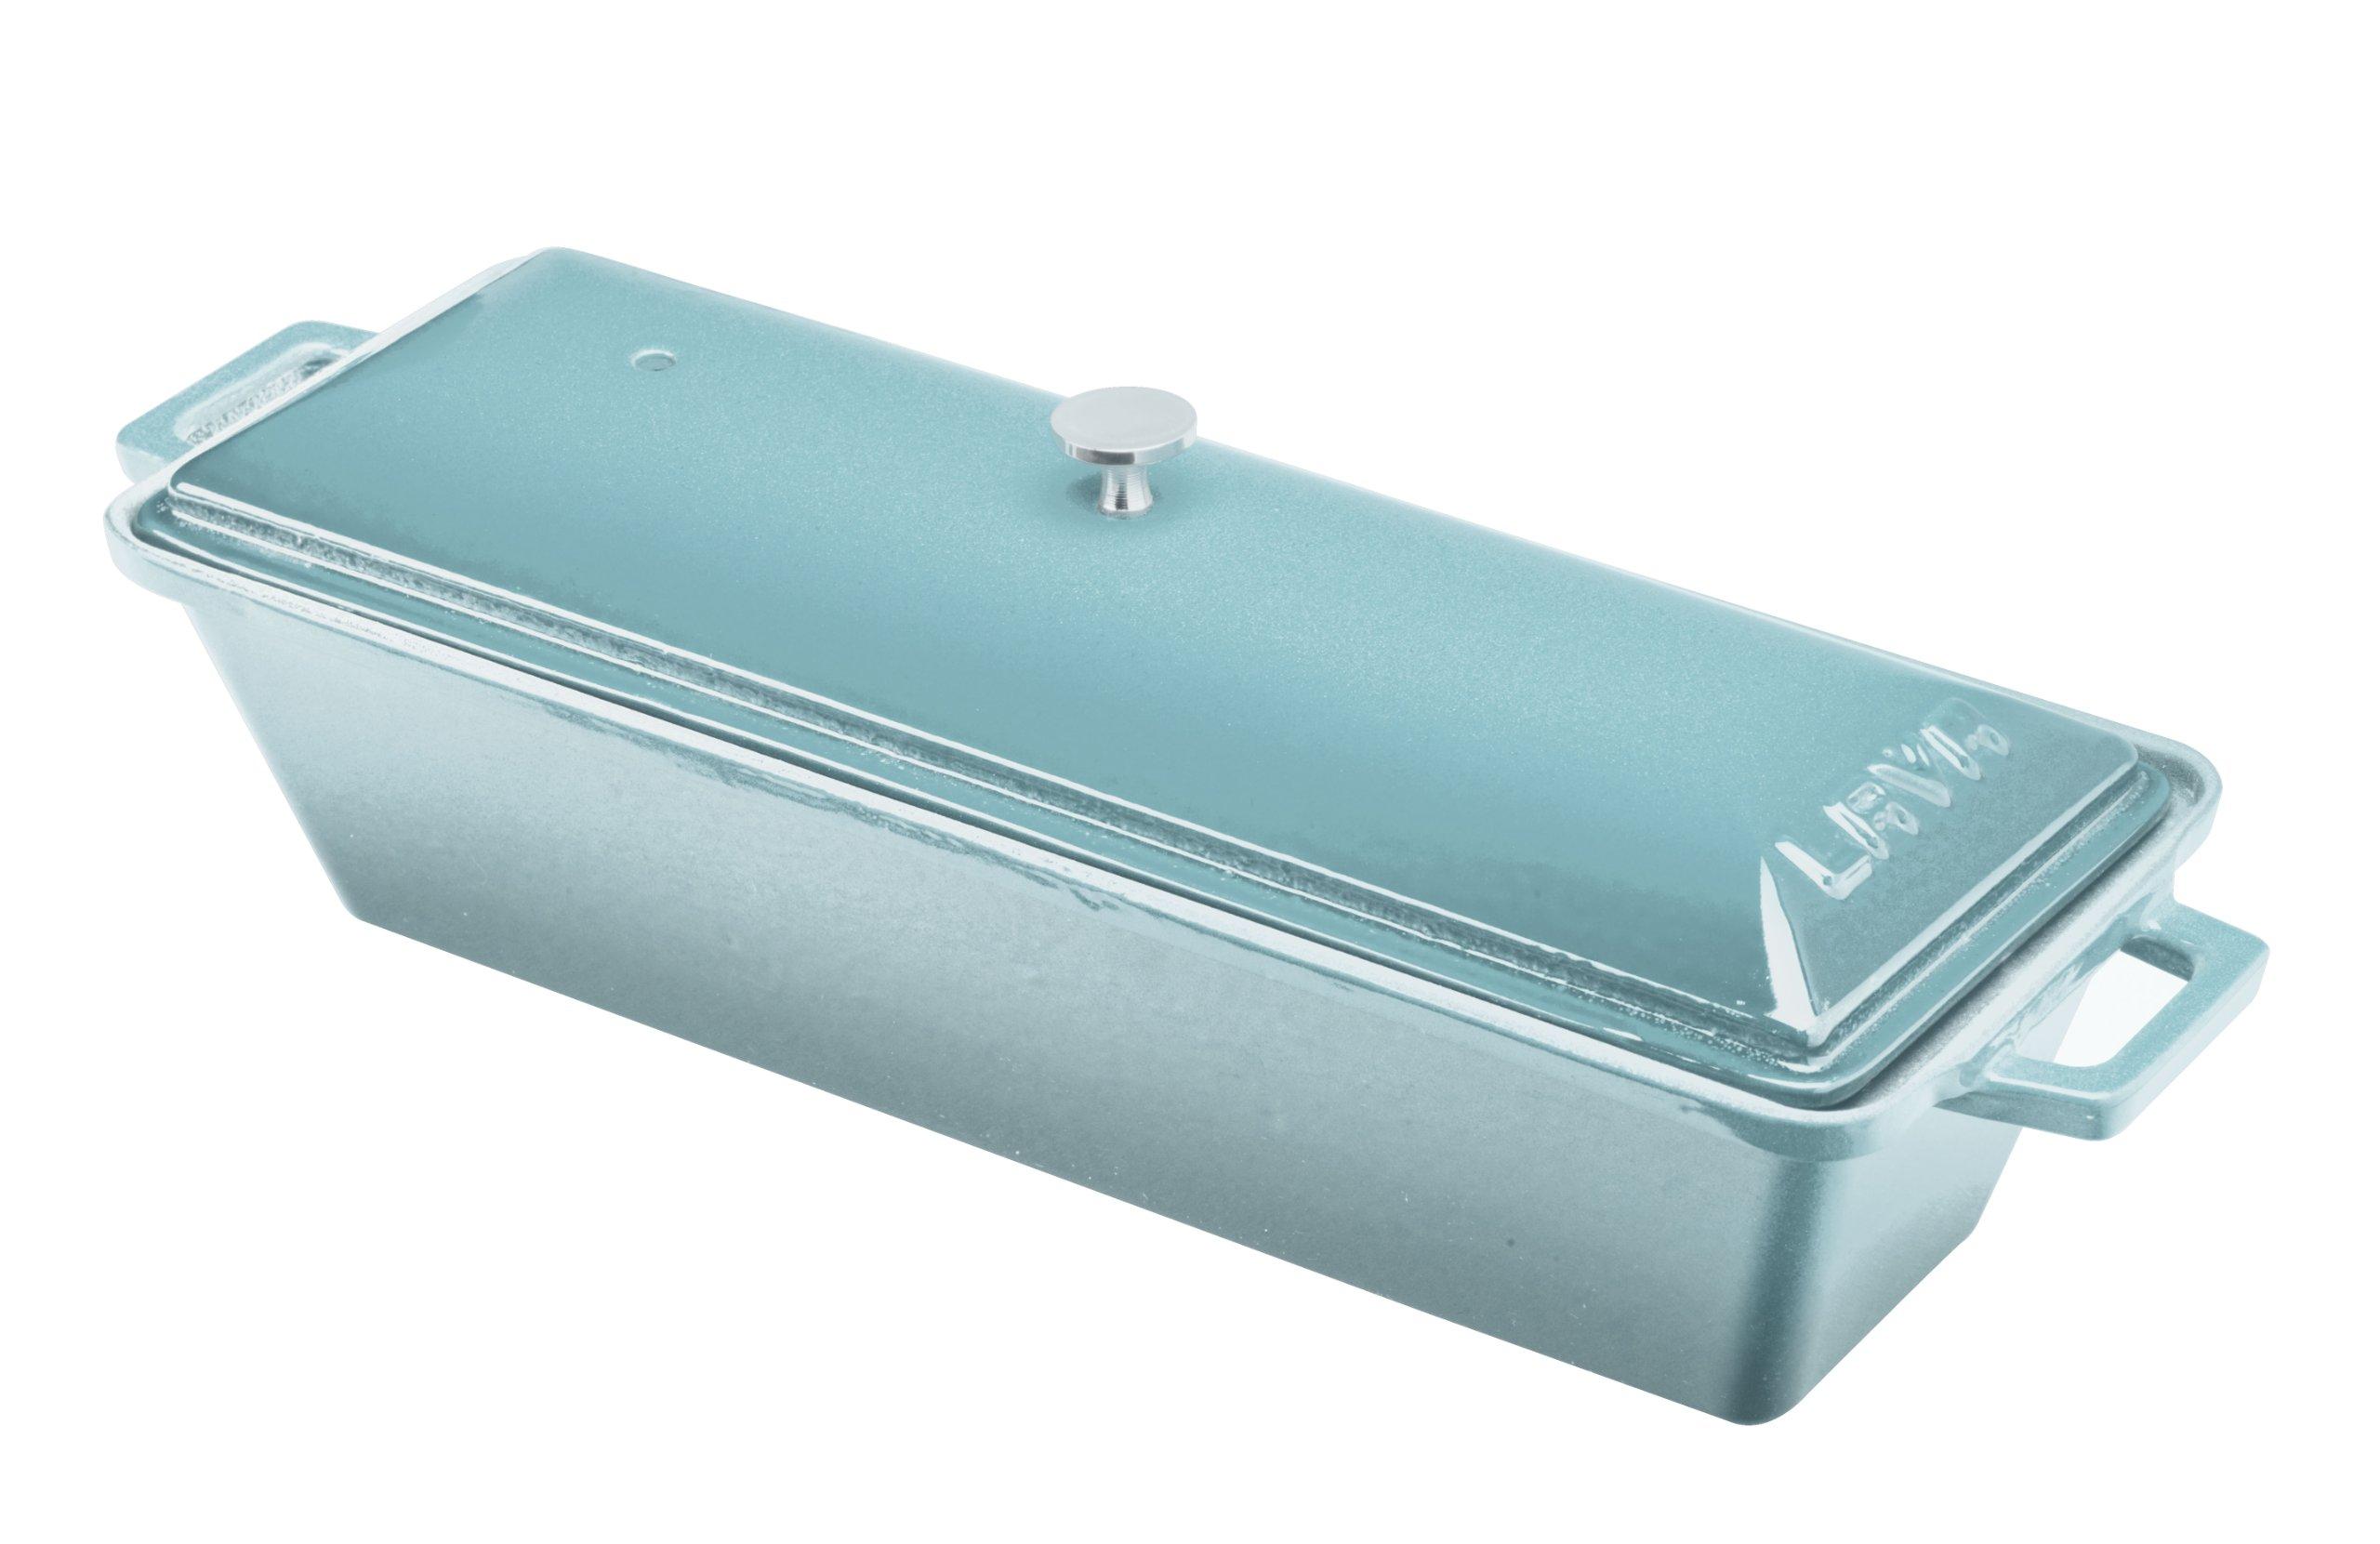 Lava Signature Enameled Cast-Iron Bread/Terrine Pot - 3 x 10 inch, Blue Opal